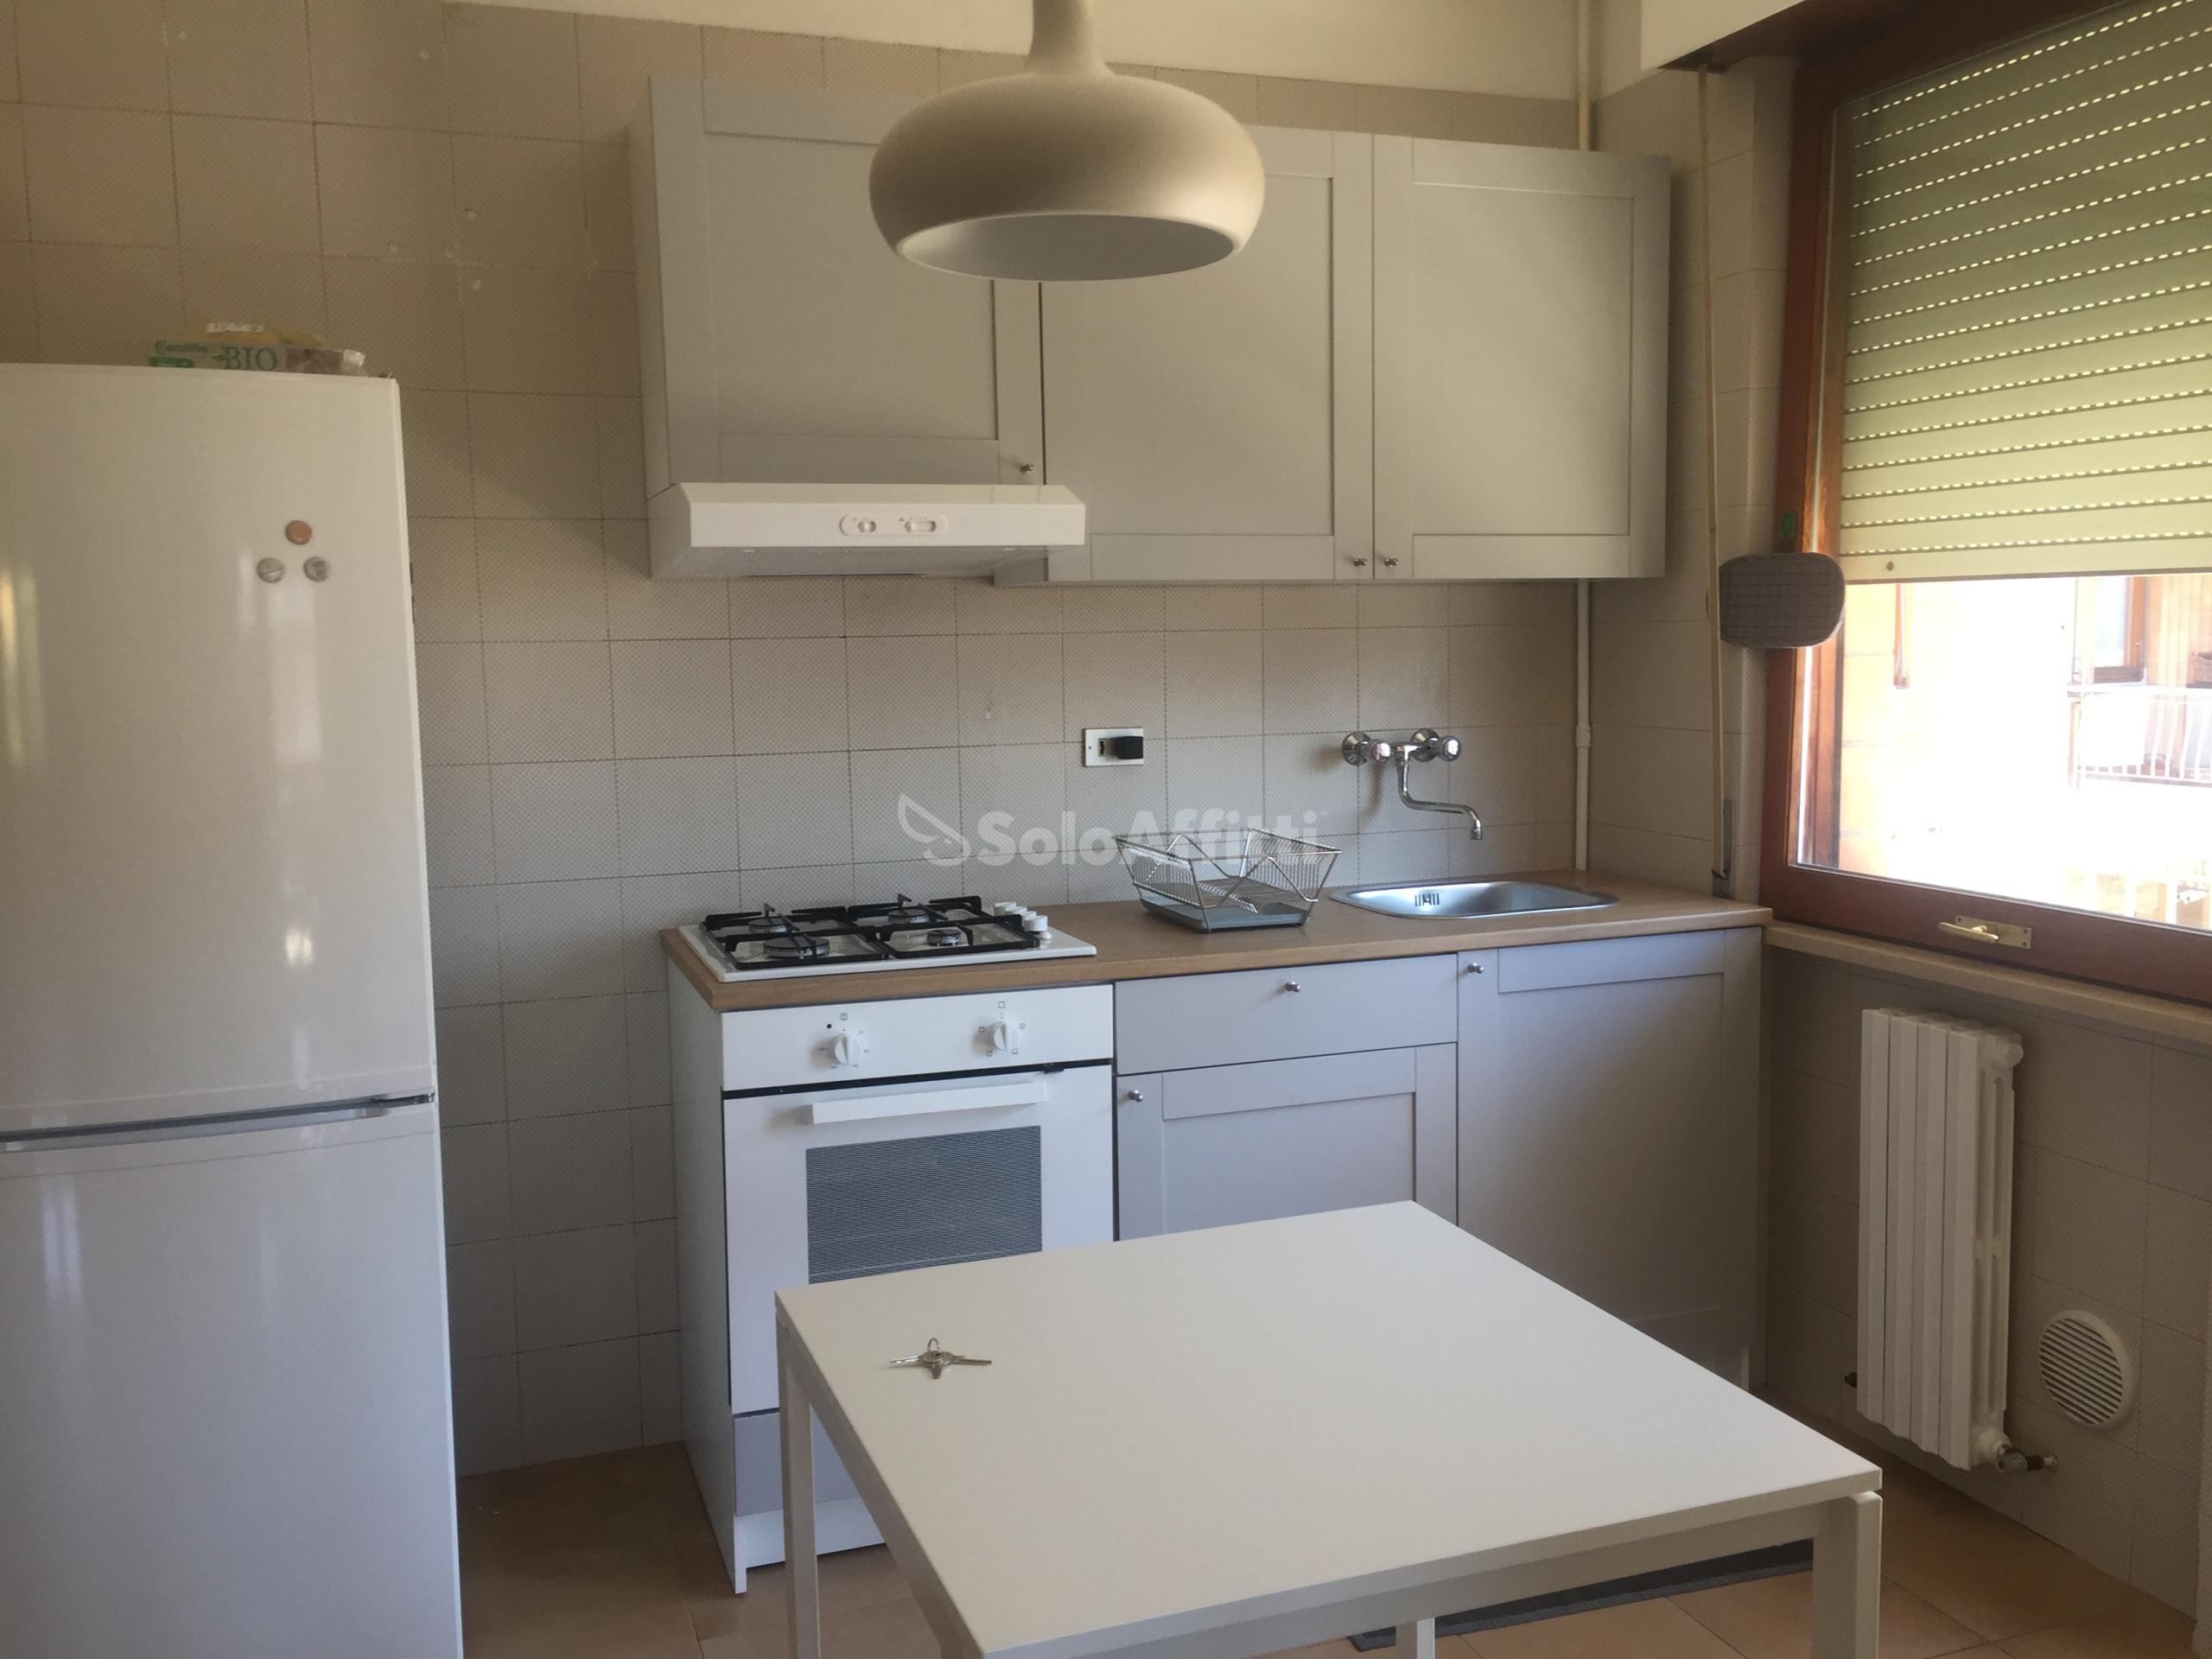 Cucina abitabile con balcone